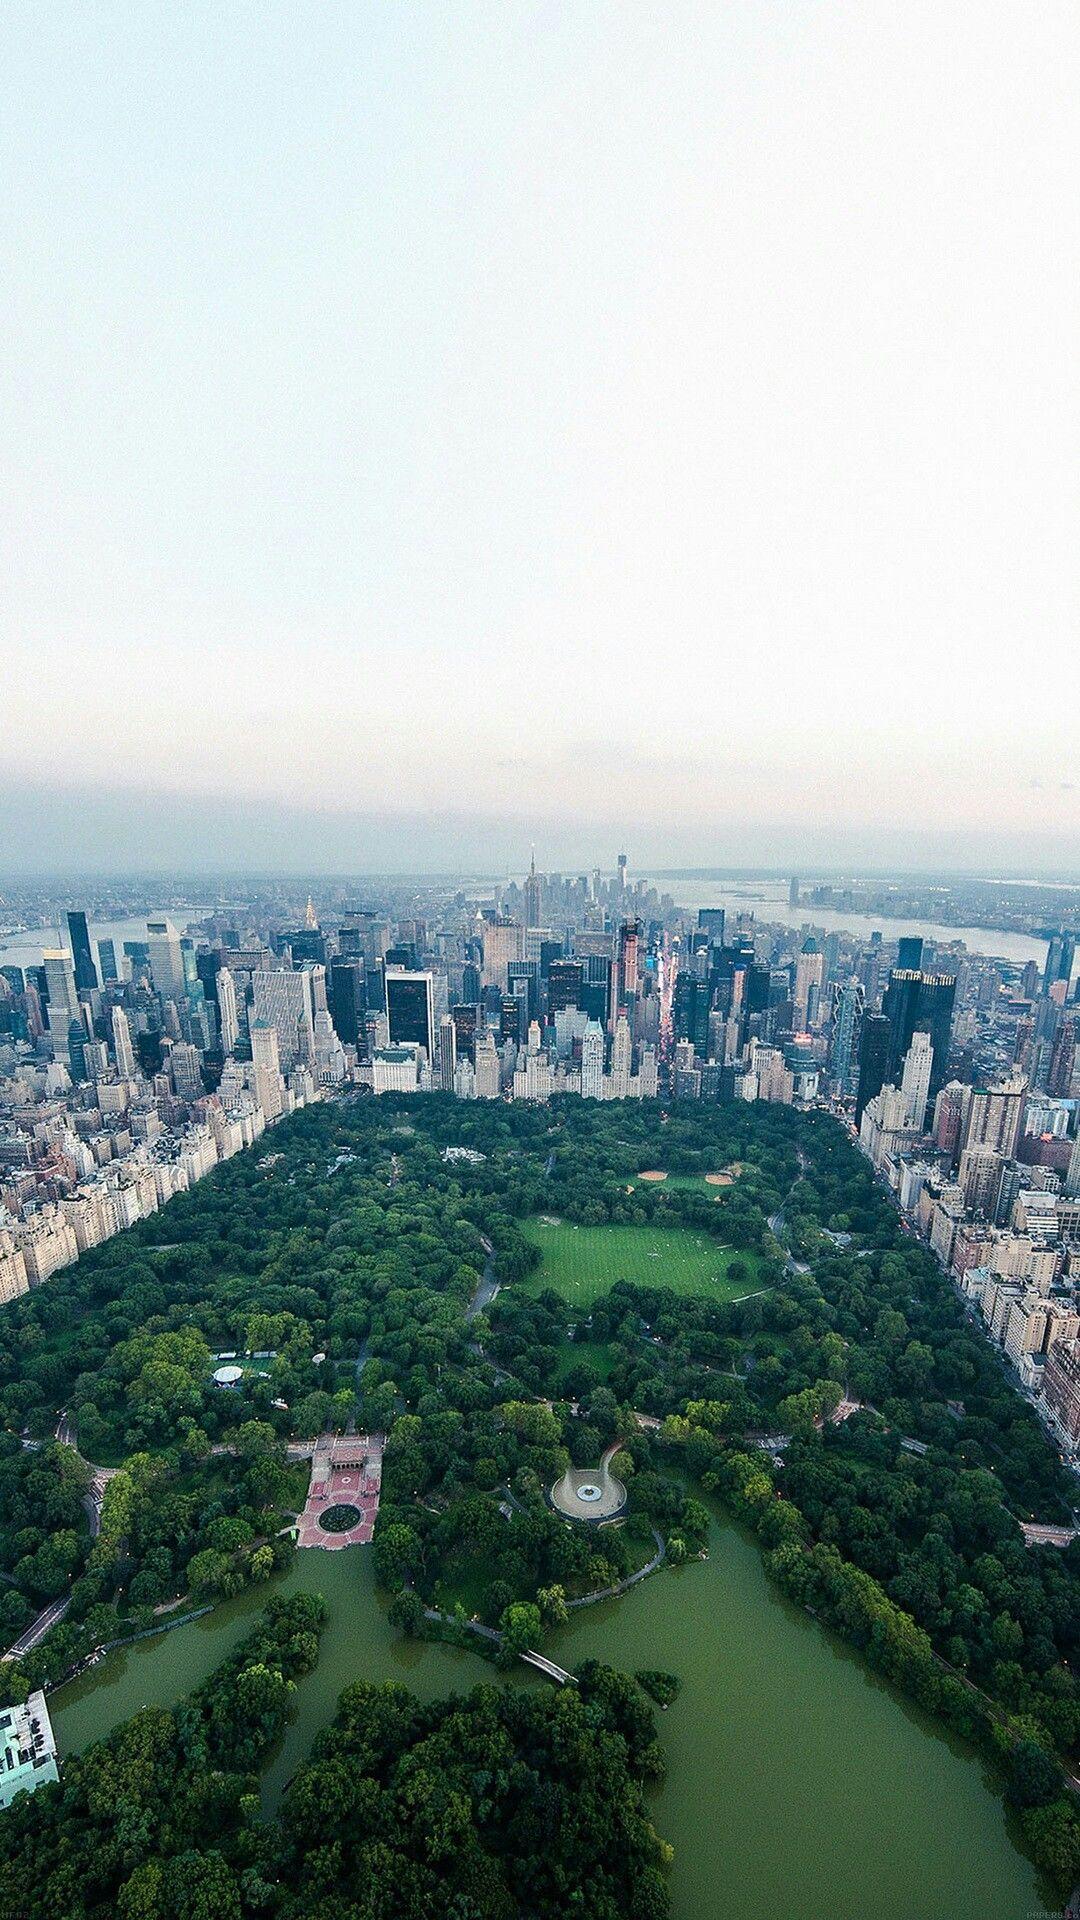 Pin By Sara Kopenec On Fondos New York Central Central Park Sky View